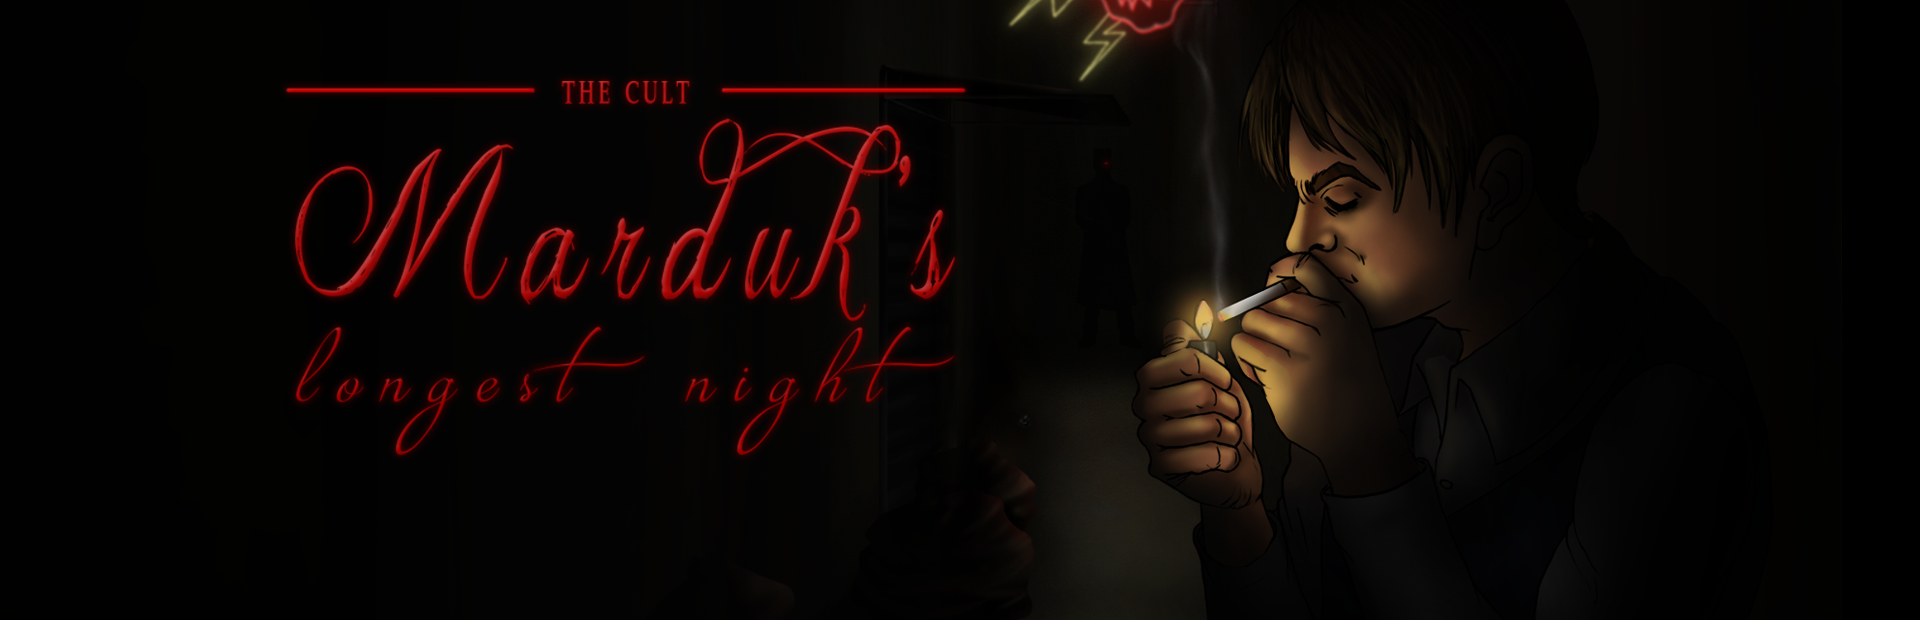 The Cult: Marduk's Longest Night